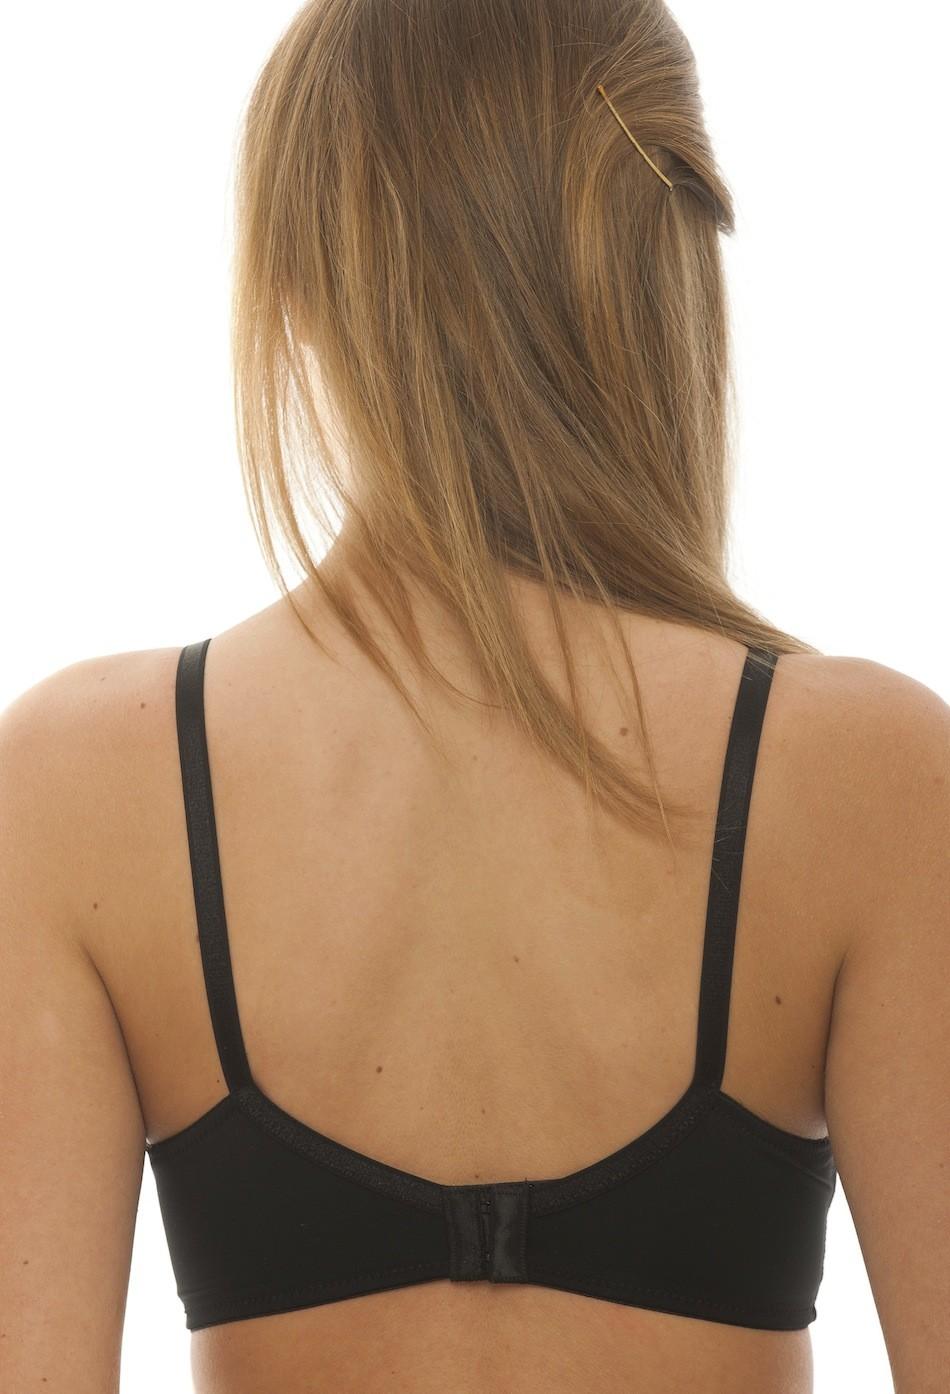 q-t-black-lace-nursing-bra-378-back.jpg